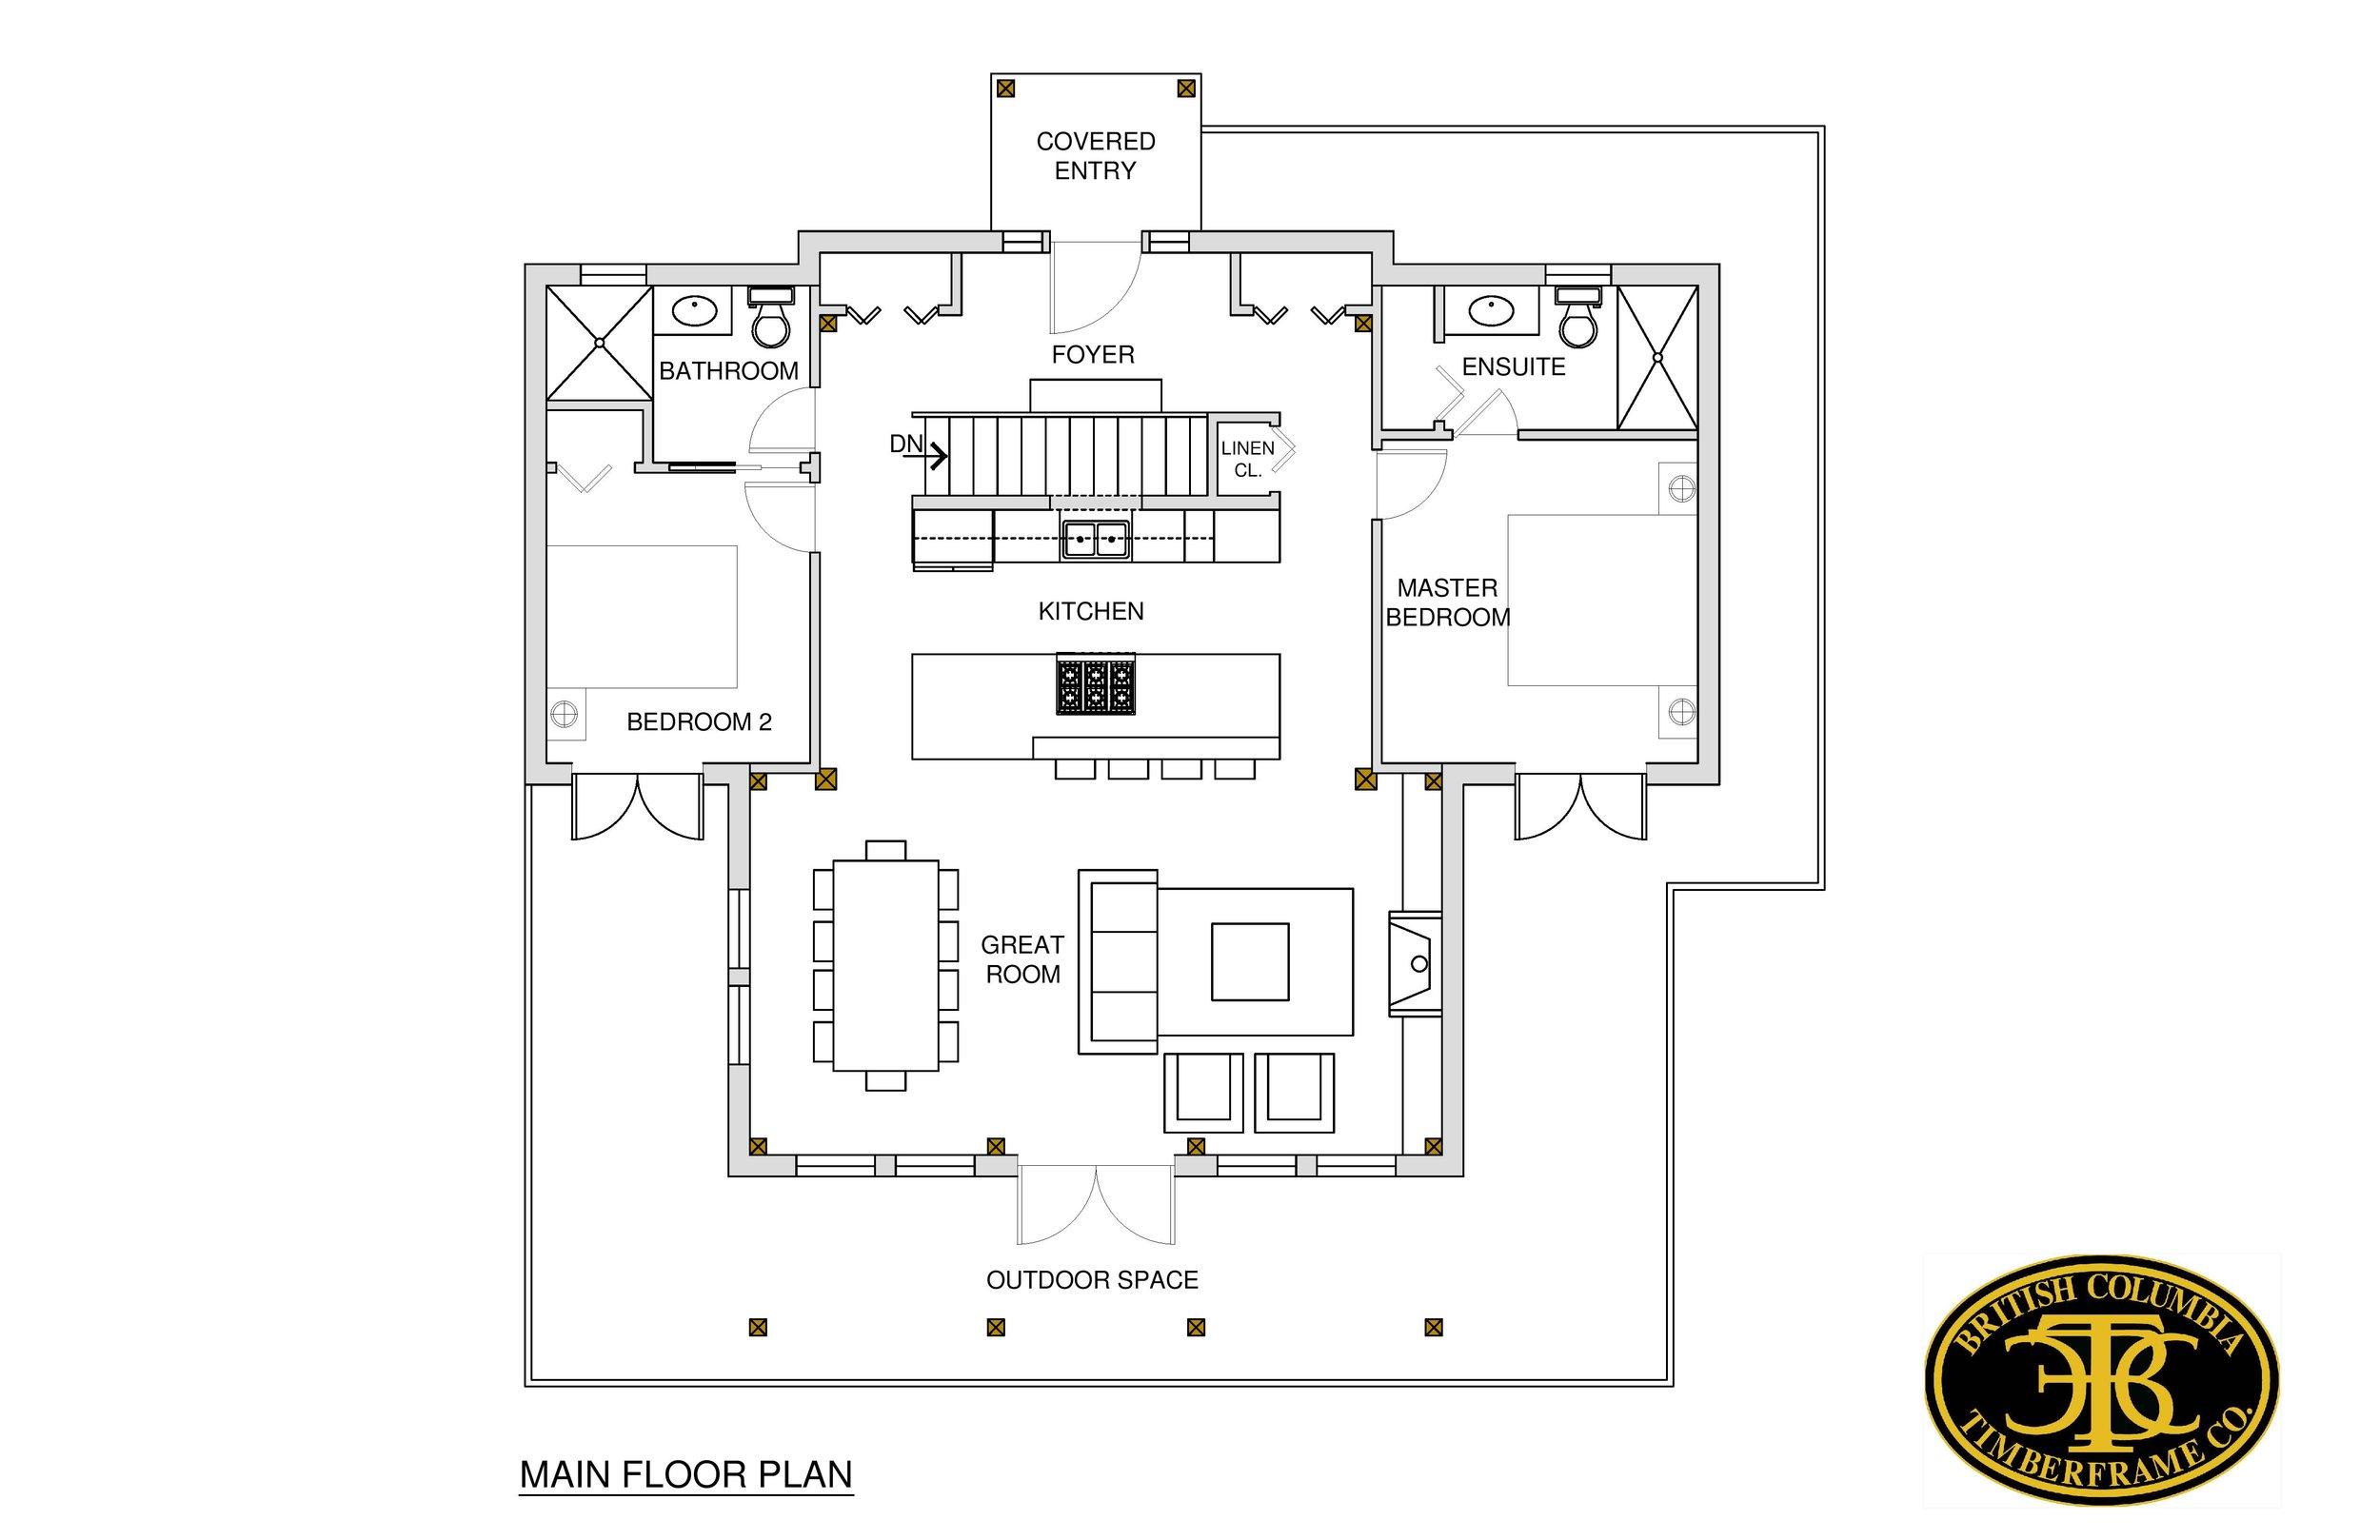 Greenlake_Main Floor Plan-page-001.jpg